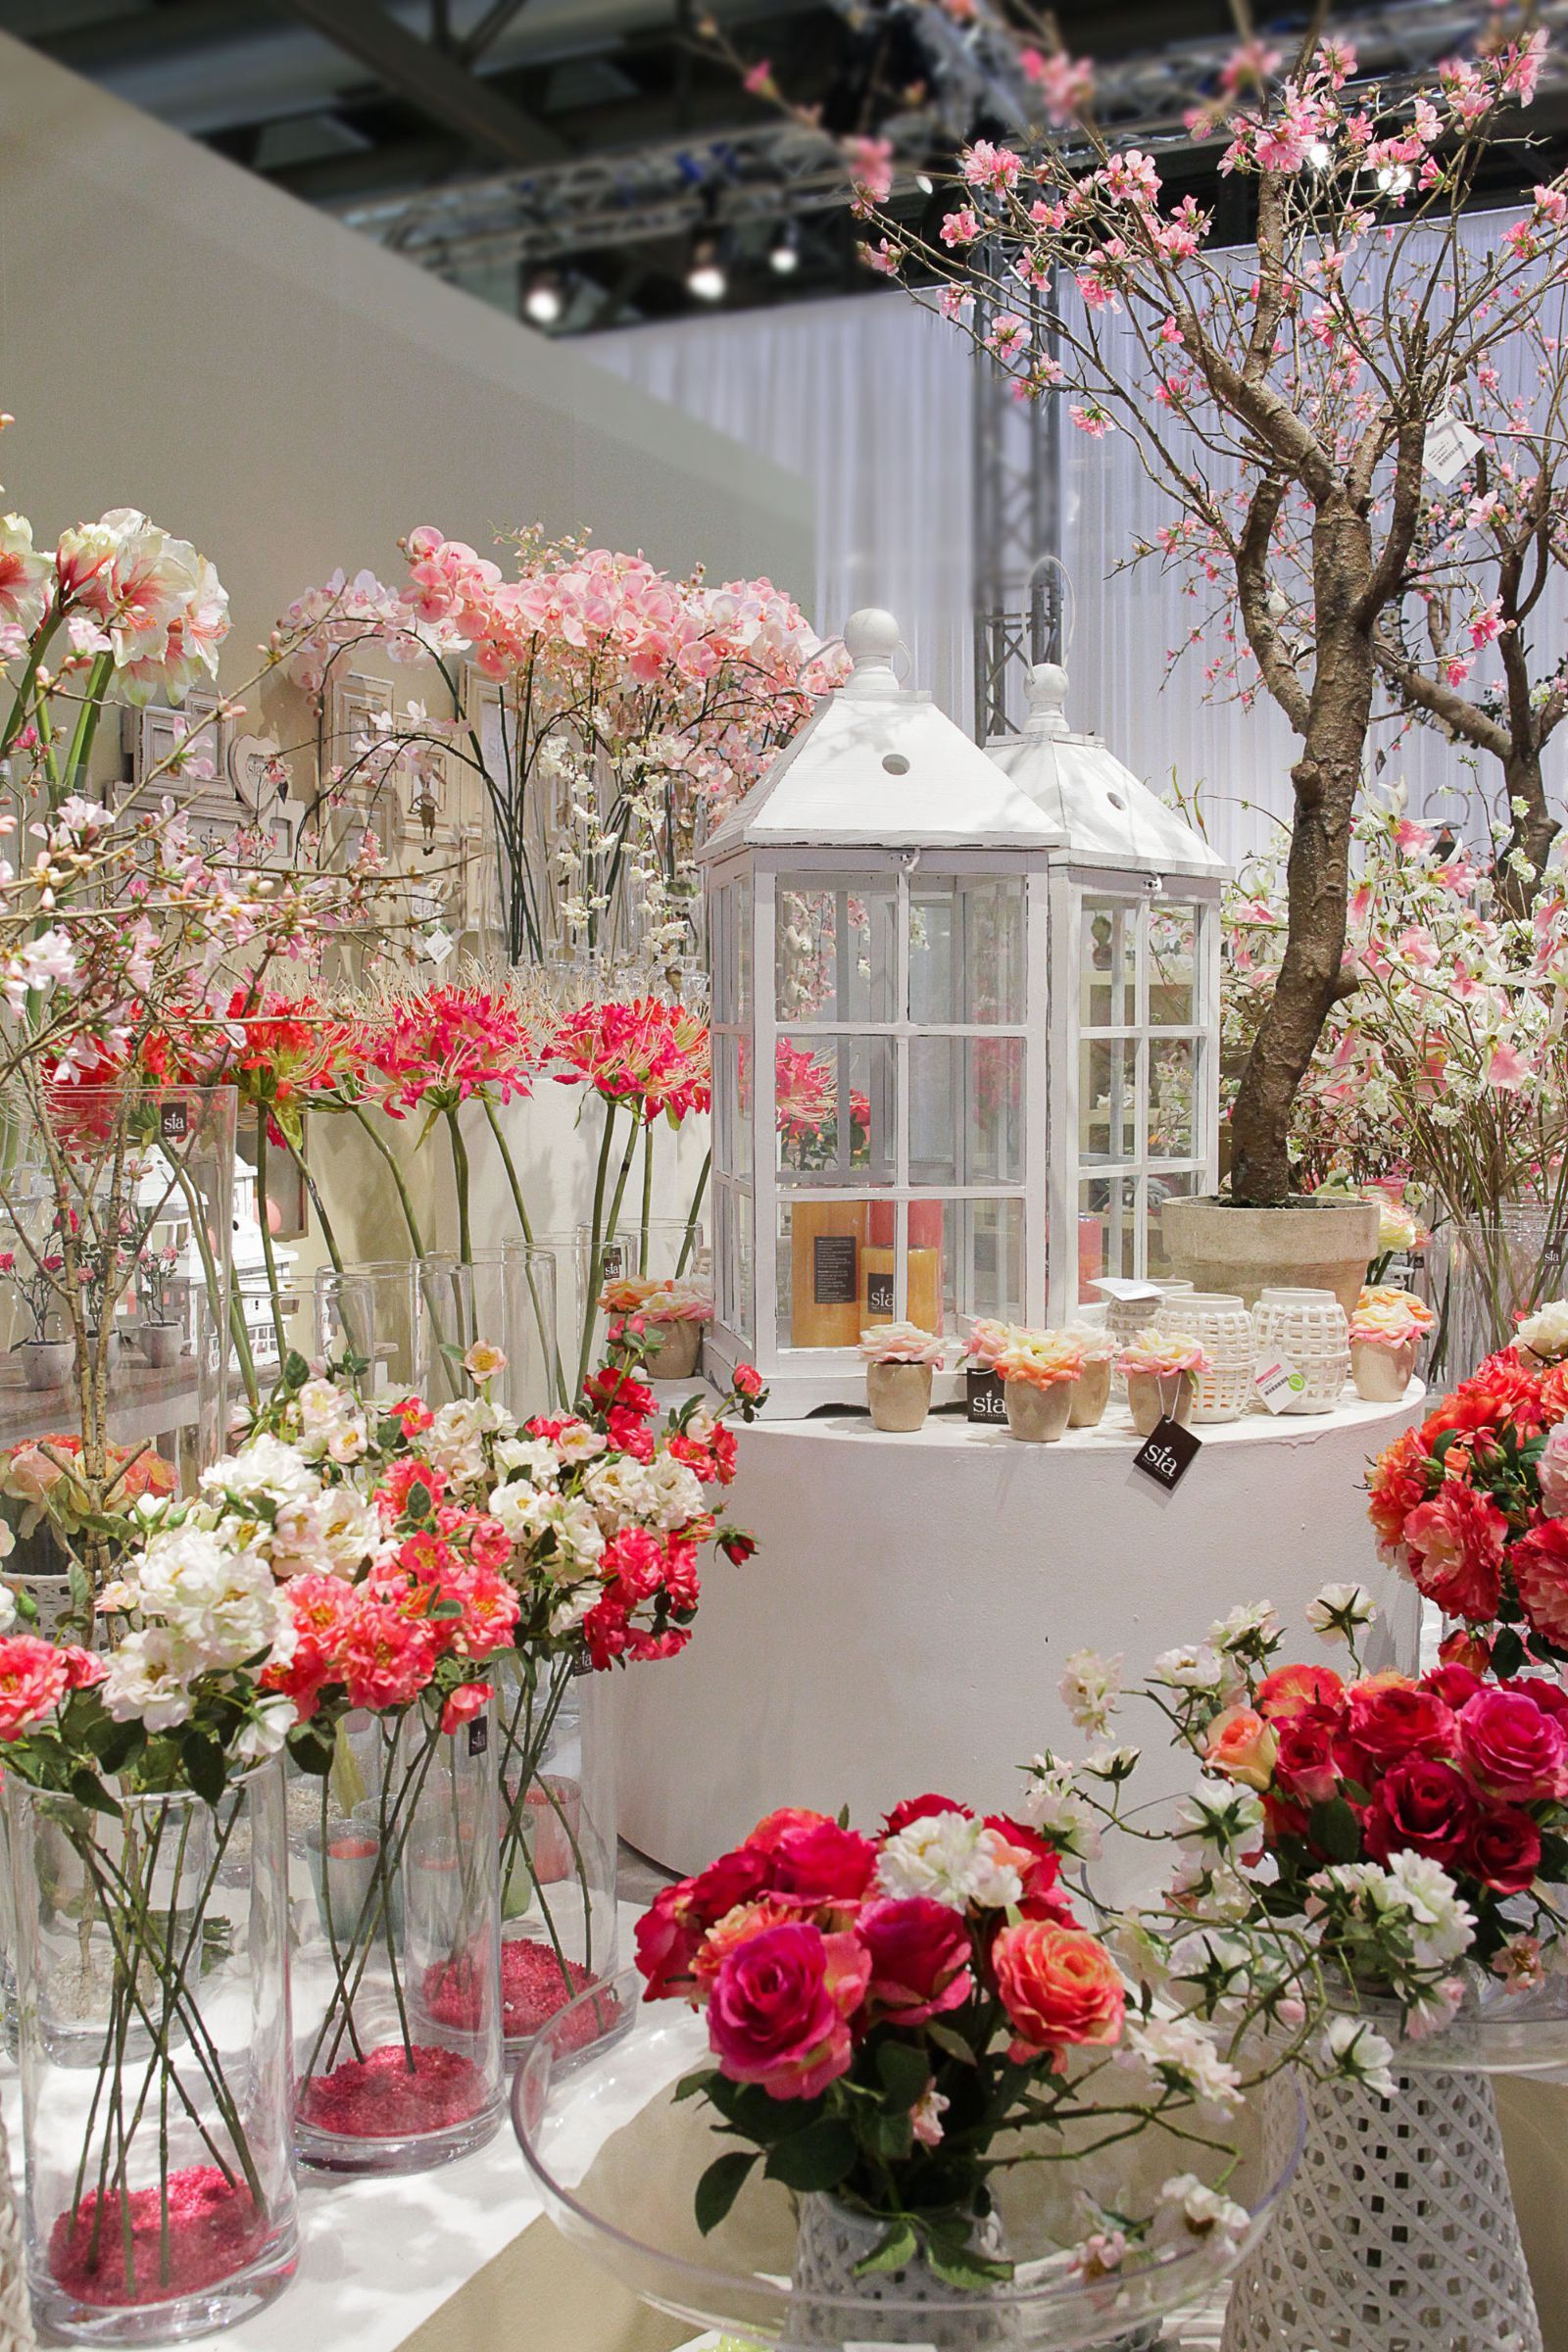 sia home fashion arreglos florales artificiales pinterest. Black Bedroom Furniture Sets. Home Design Ideas